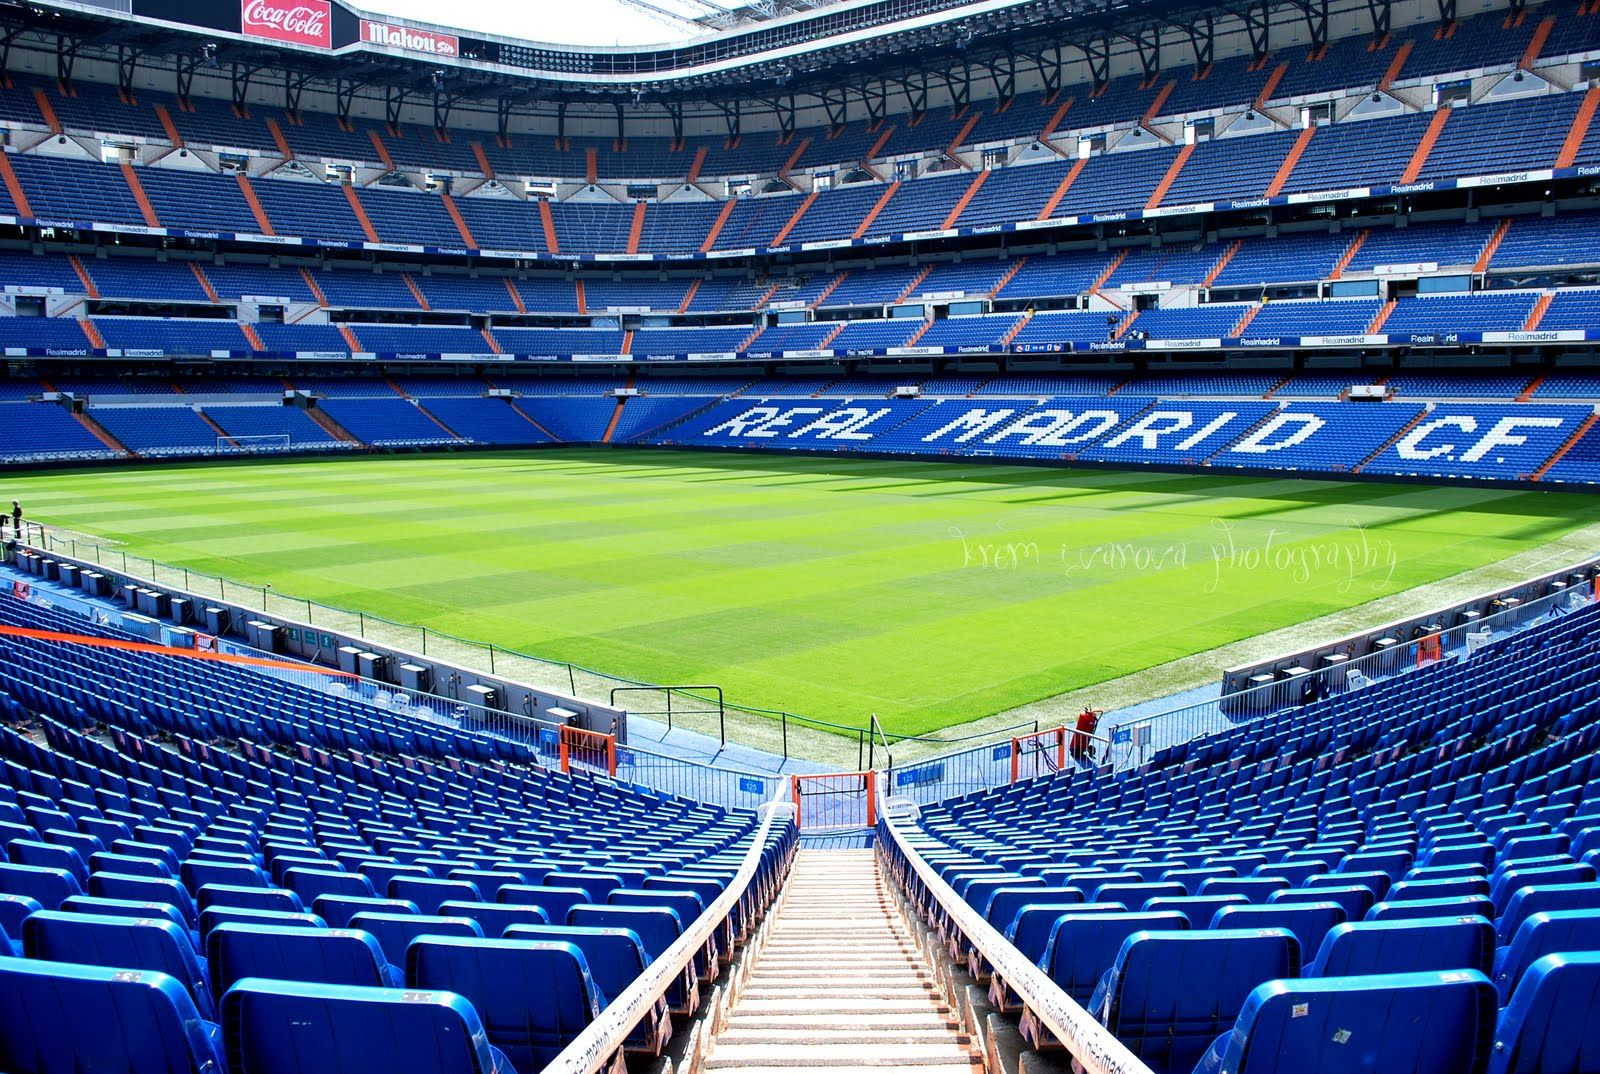 Real madrid stadium wallpapers hd hd wallpapers hd images art photos football pinterest - Soccer stadium hd ...